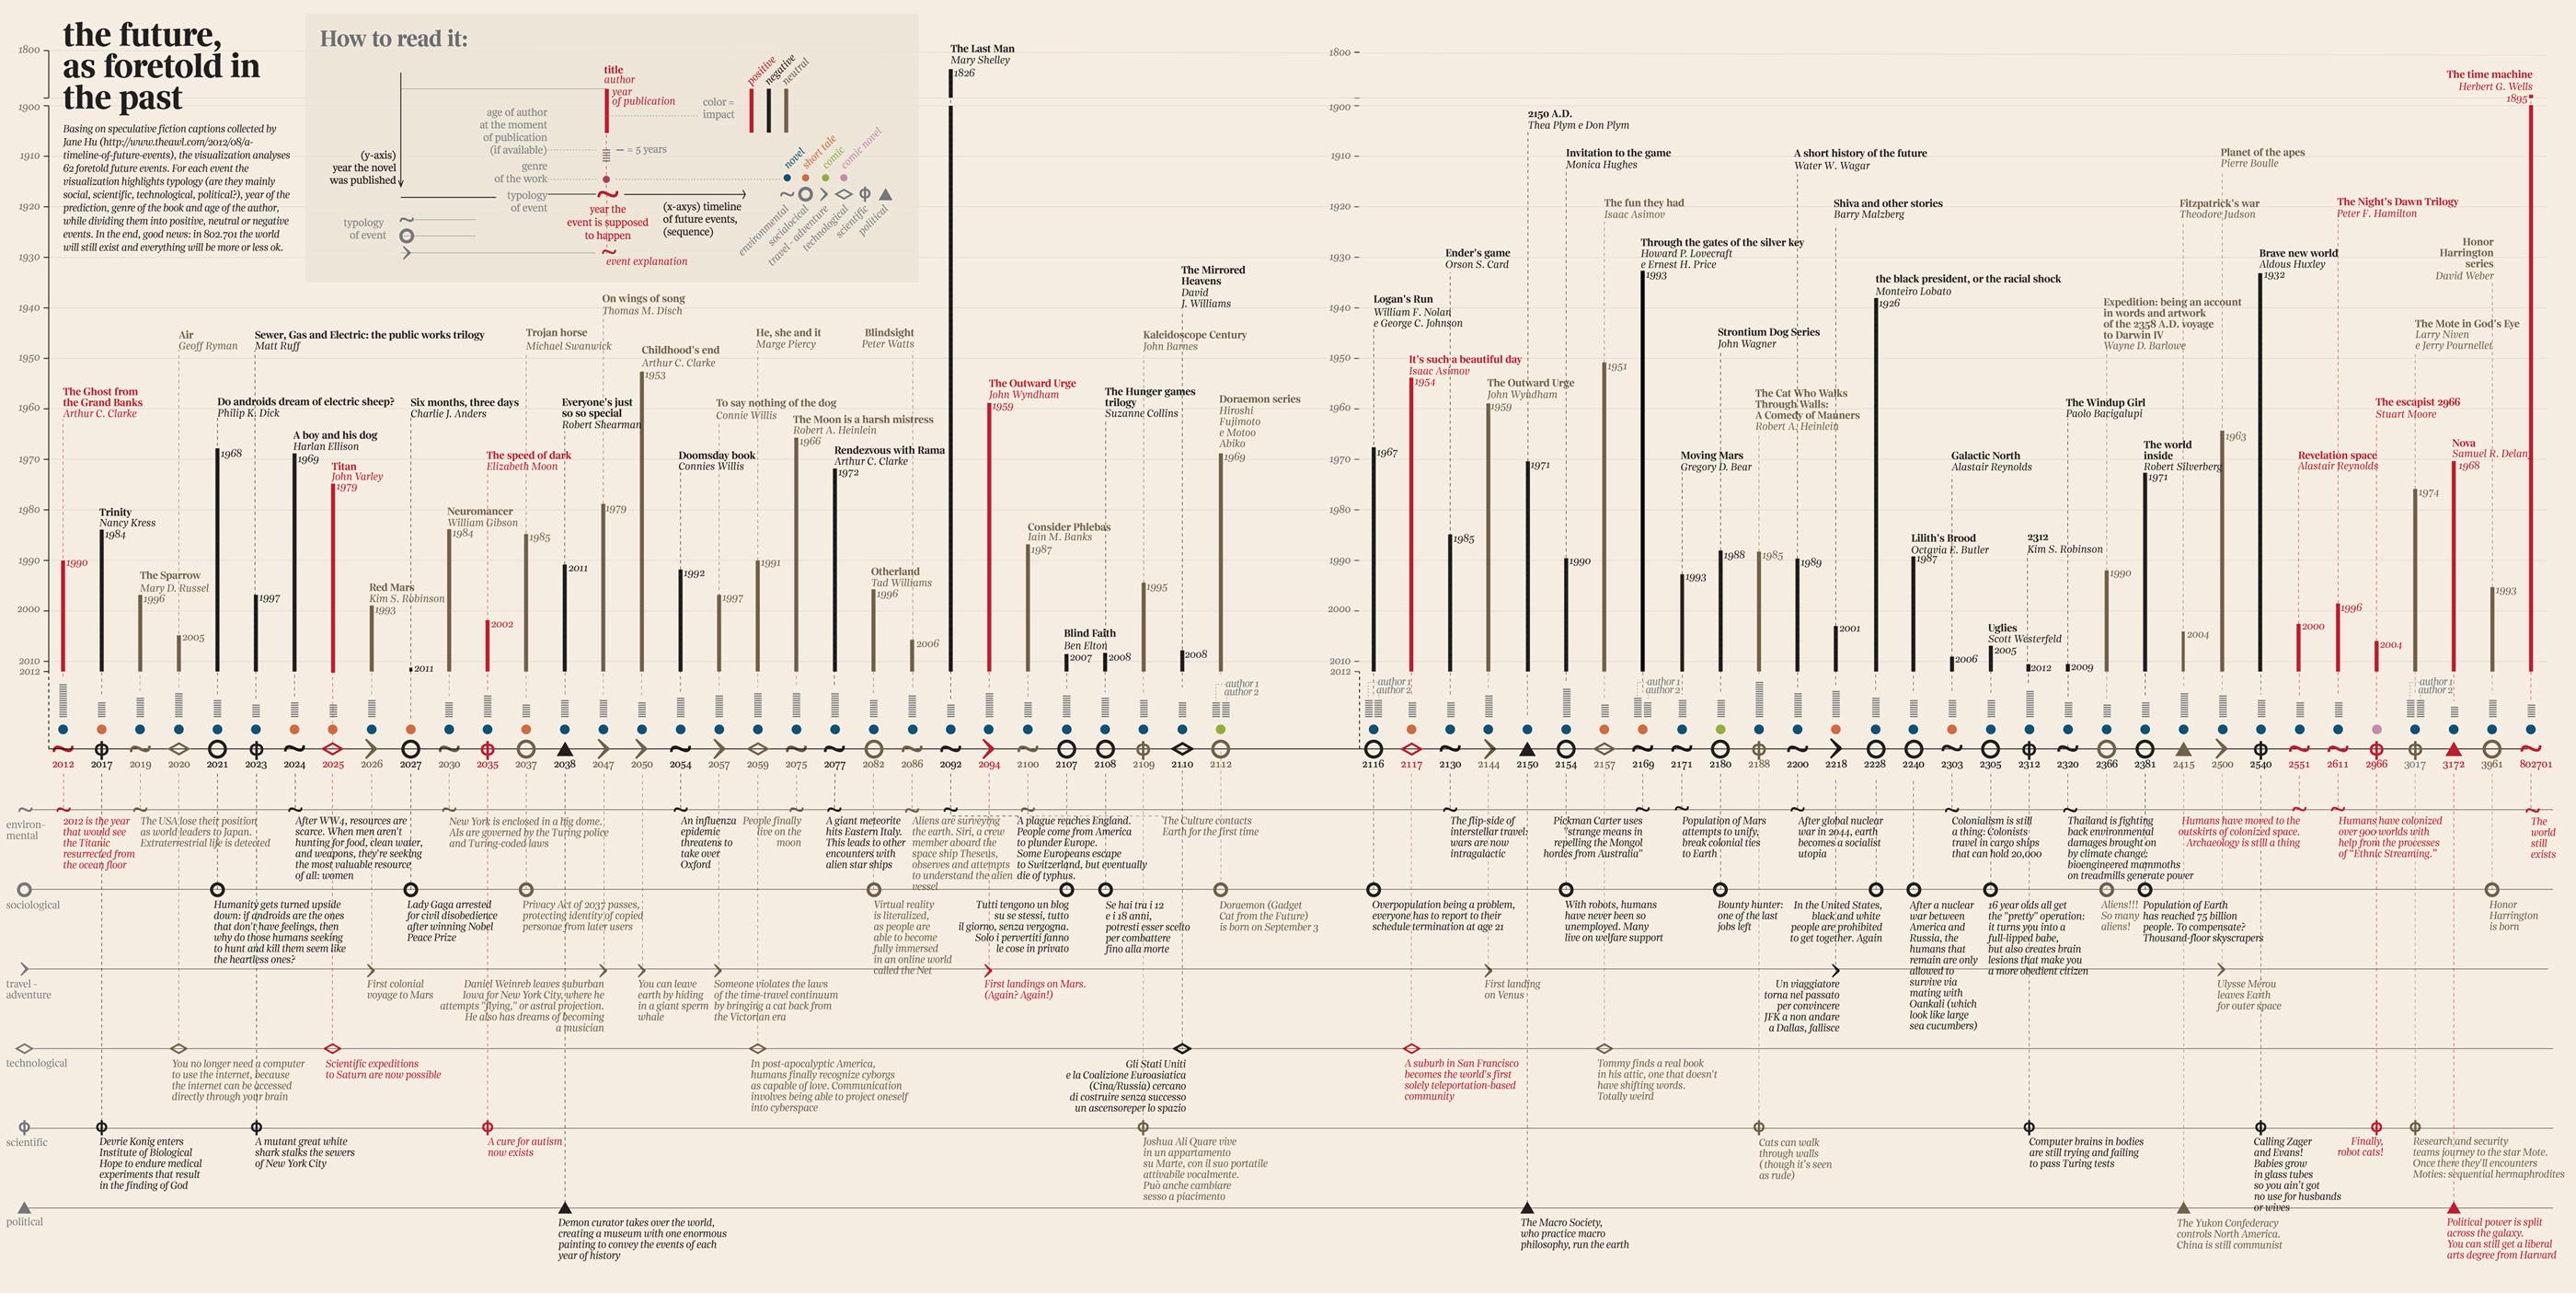 Futuristic Books-Infographic